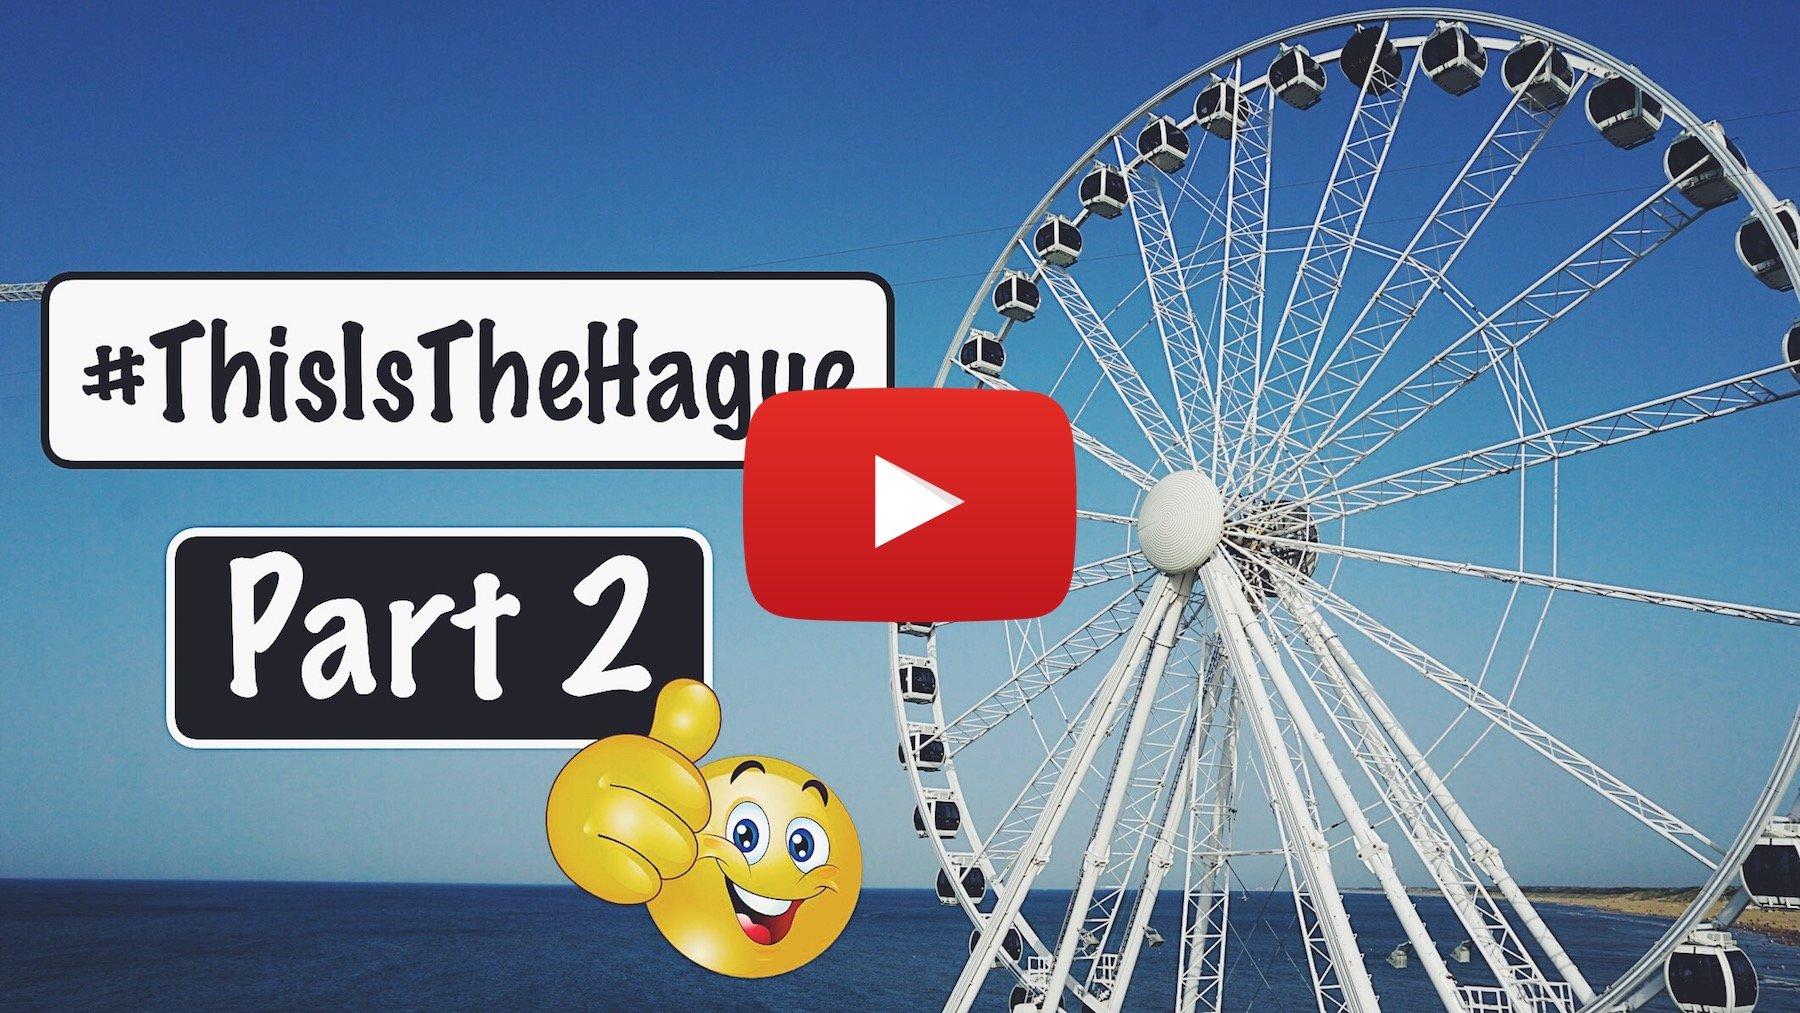 jenna minnie fashion blog youtube video den haag the hague travel